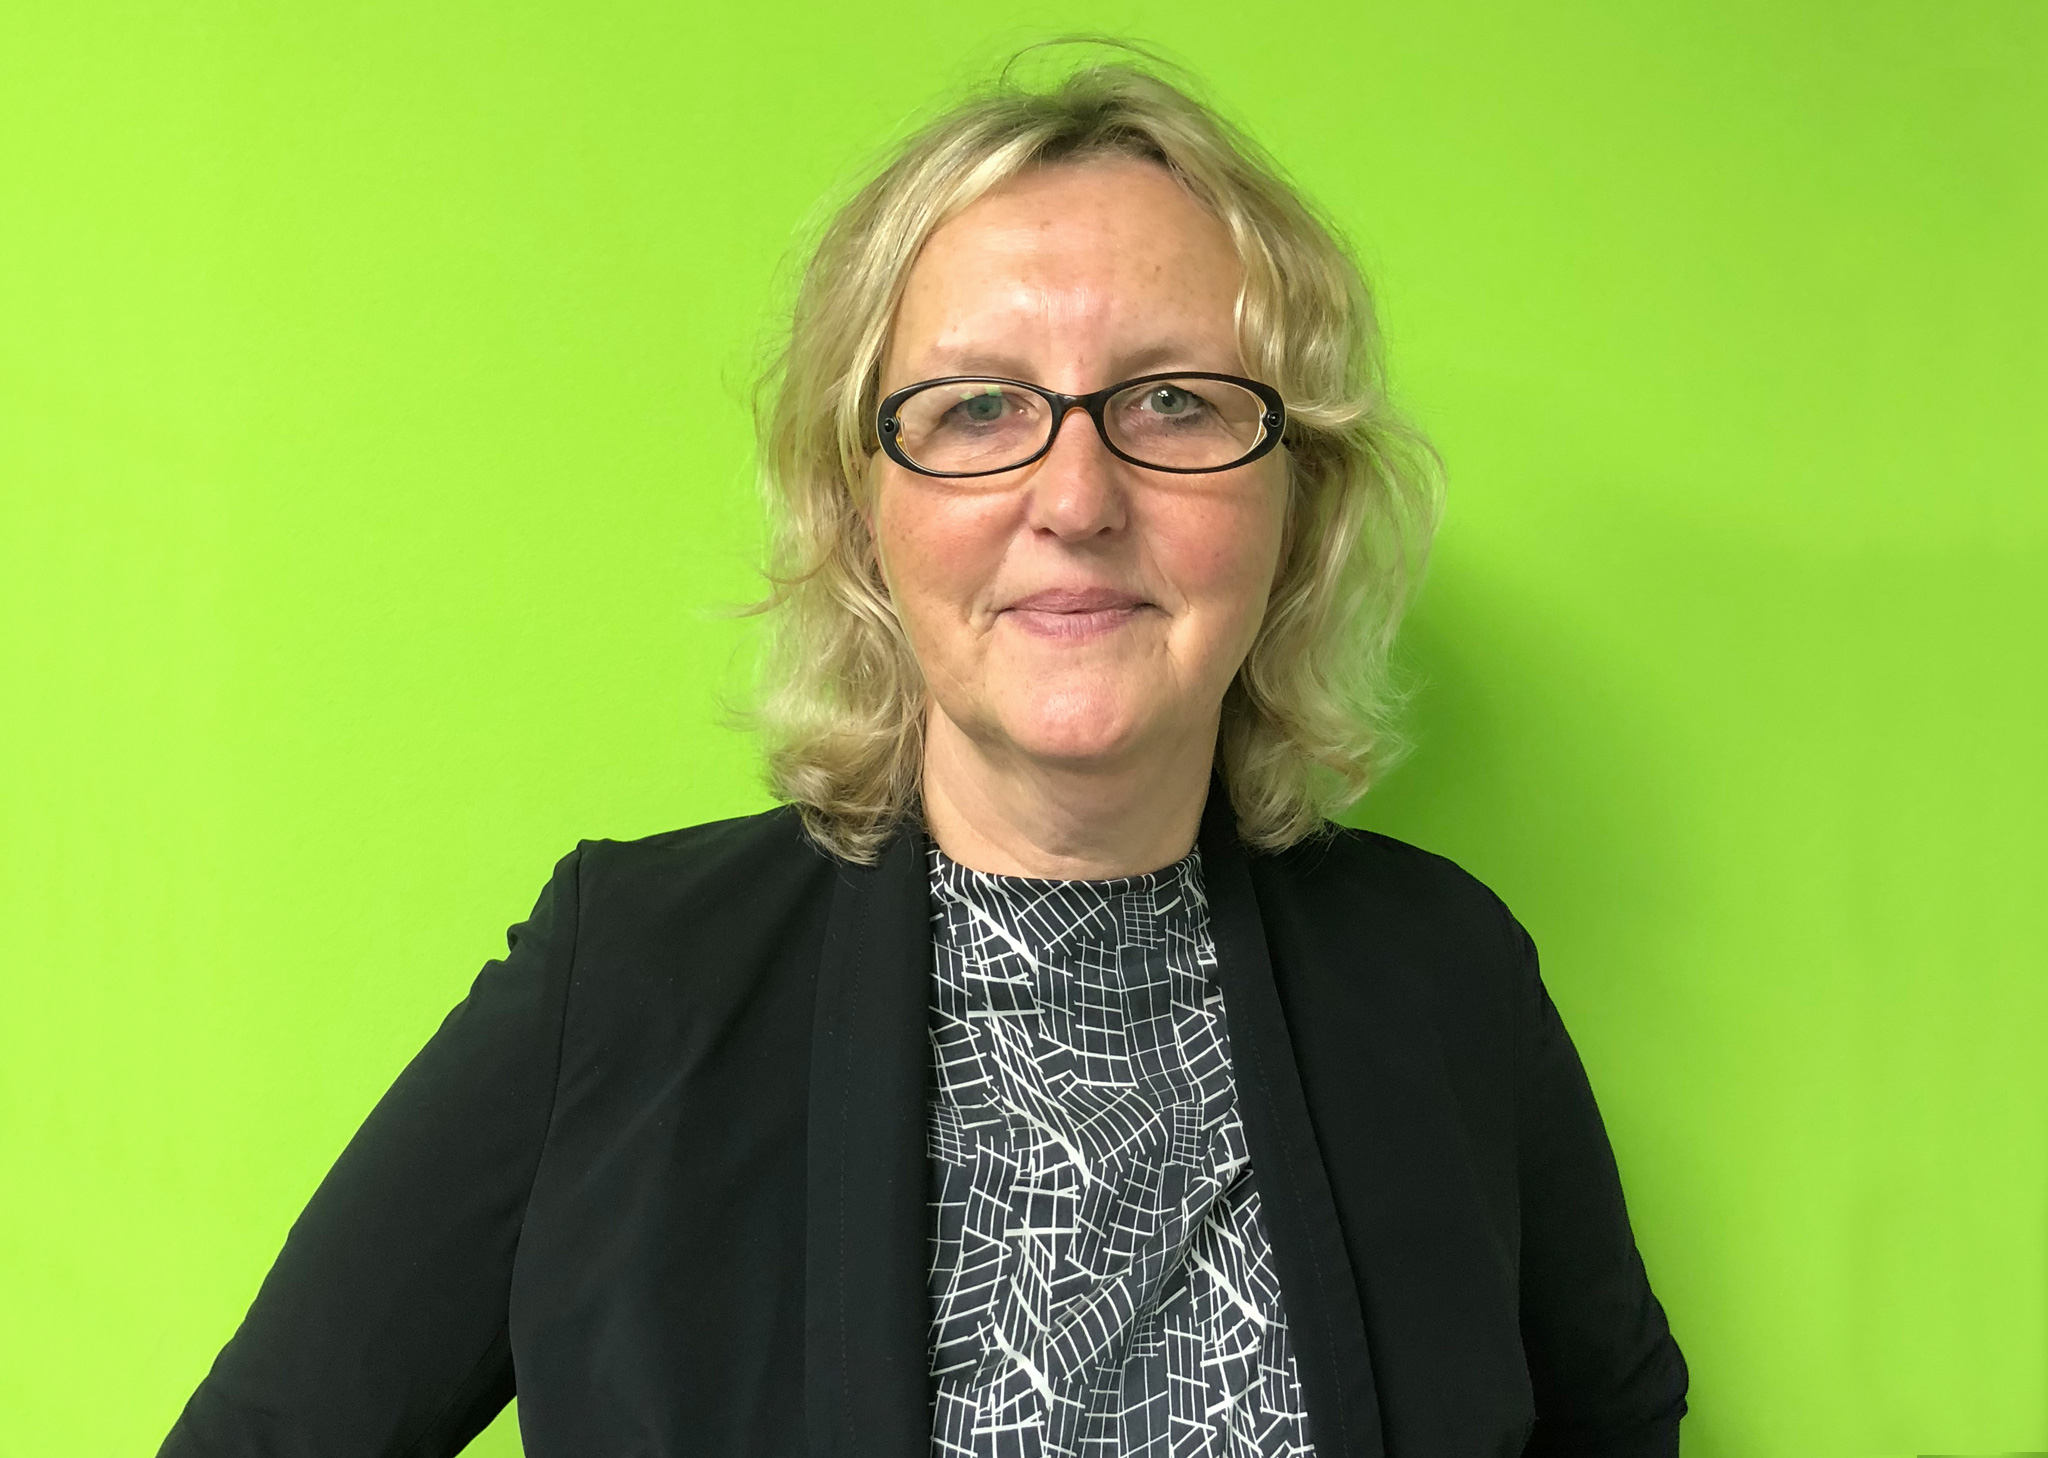 WindPlan GmbH Geschäftsführer Kayen Witthohn